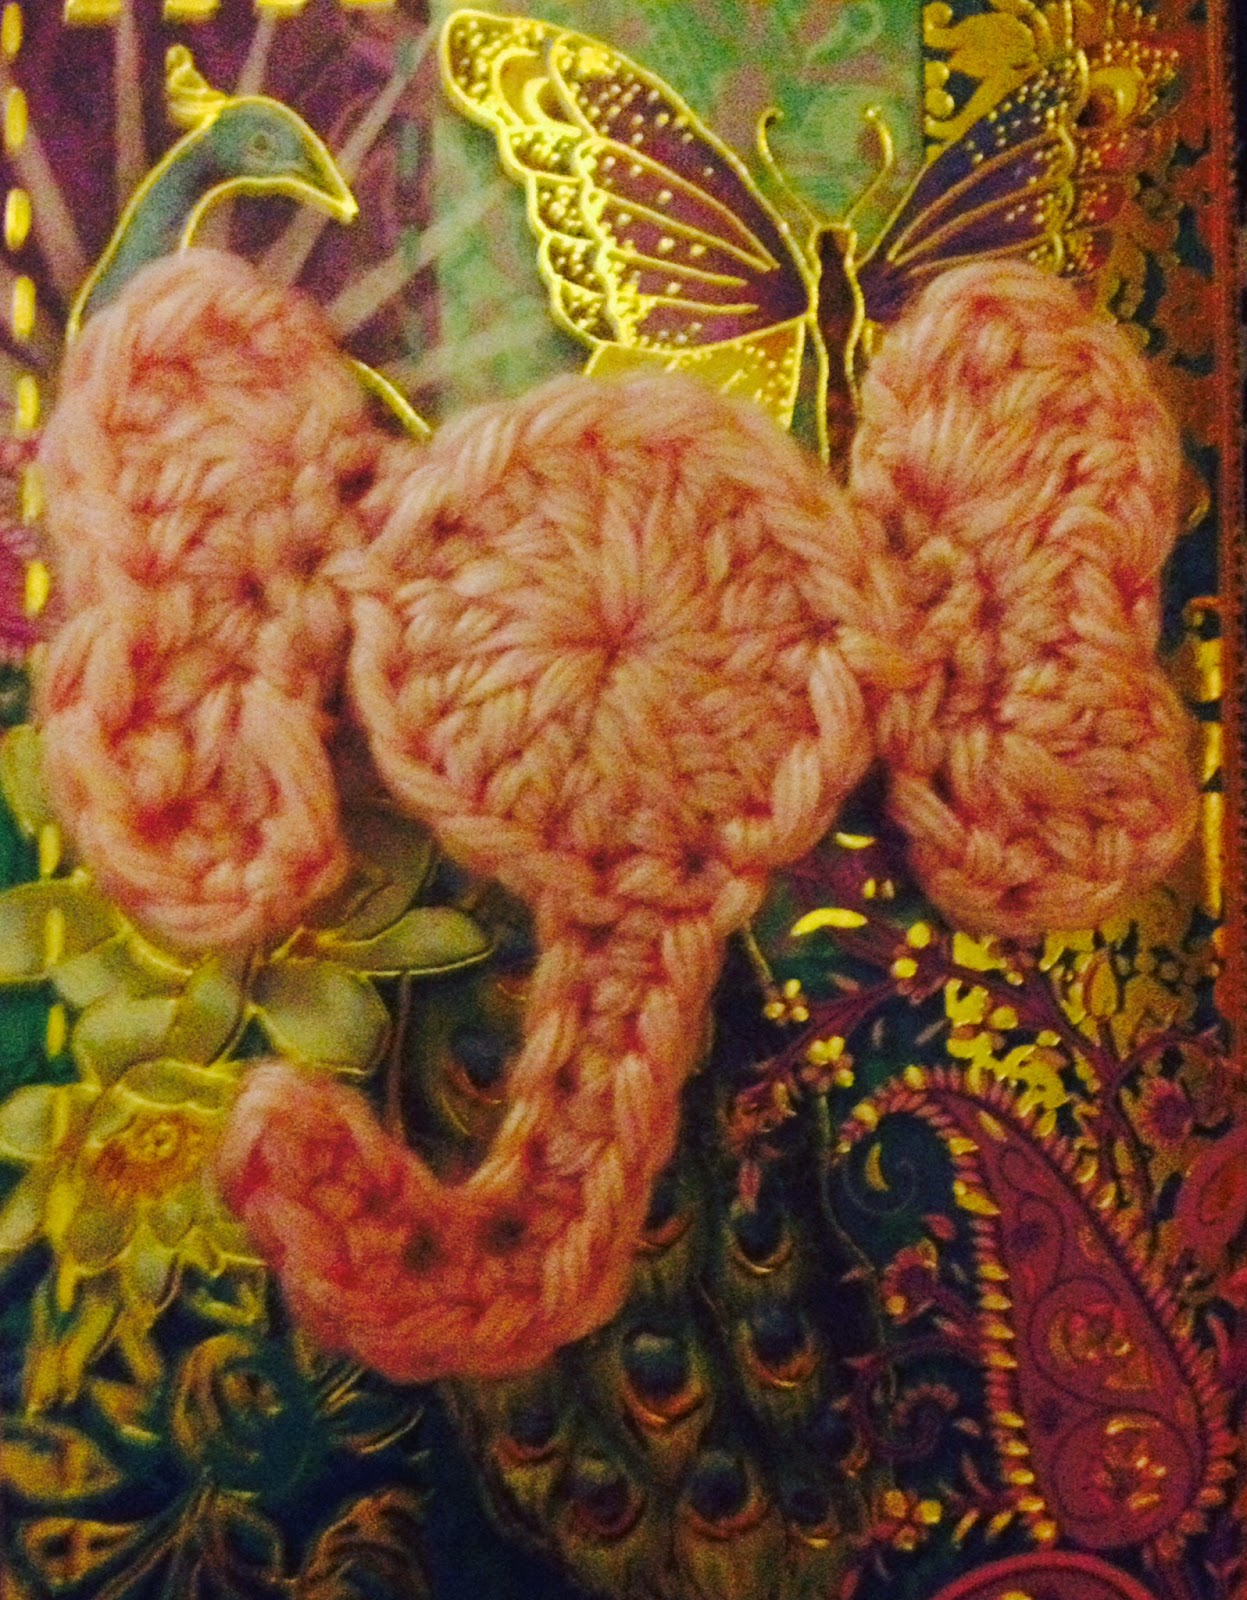 Elephant Applique ~ Manda Proell - MandaLynn's Crochet Treasures